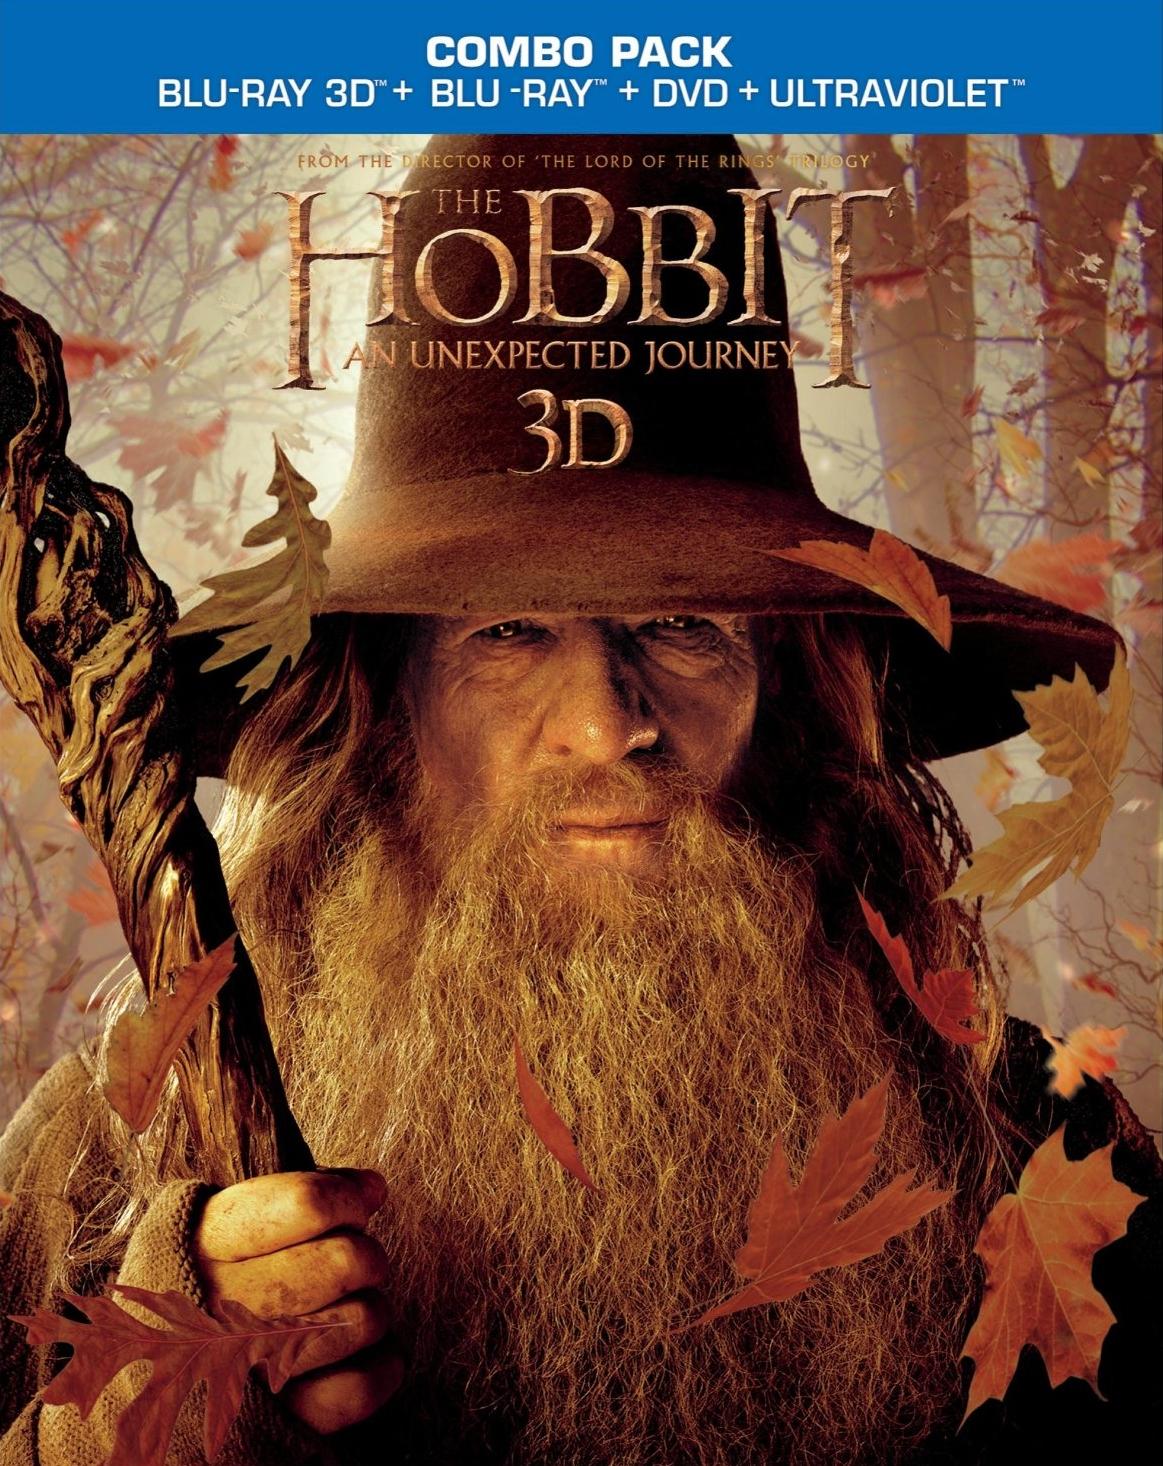 http://3.bp.blogspot.com/-8zzTSmEc8Kc/UR_SKIRrkWI/AAAAAAAAHLo/sMZwPj7cIPI/s1600/Hobbit+cover.jpg